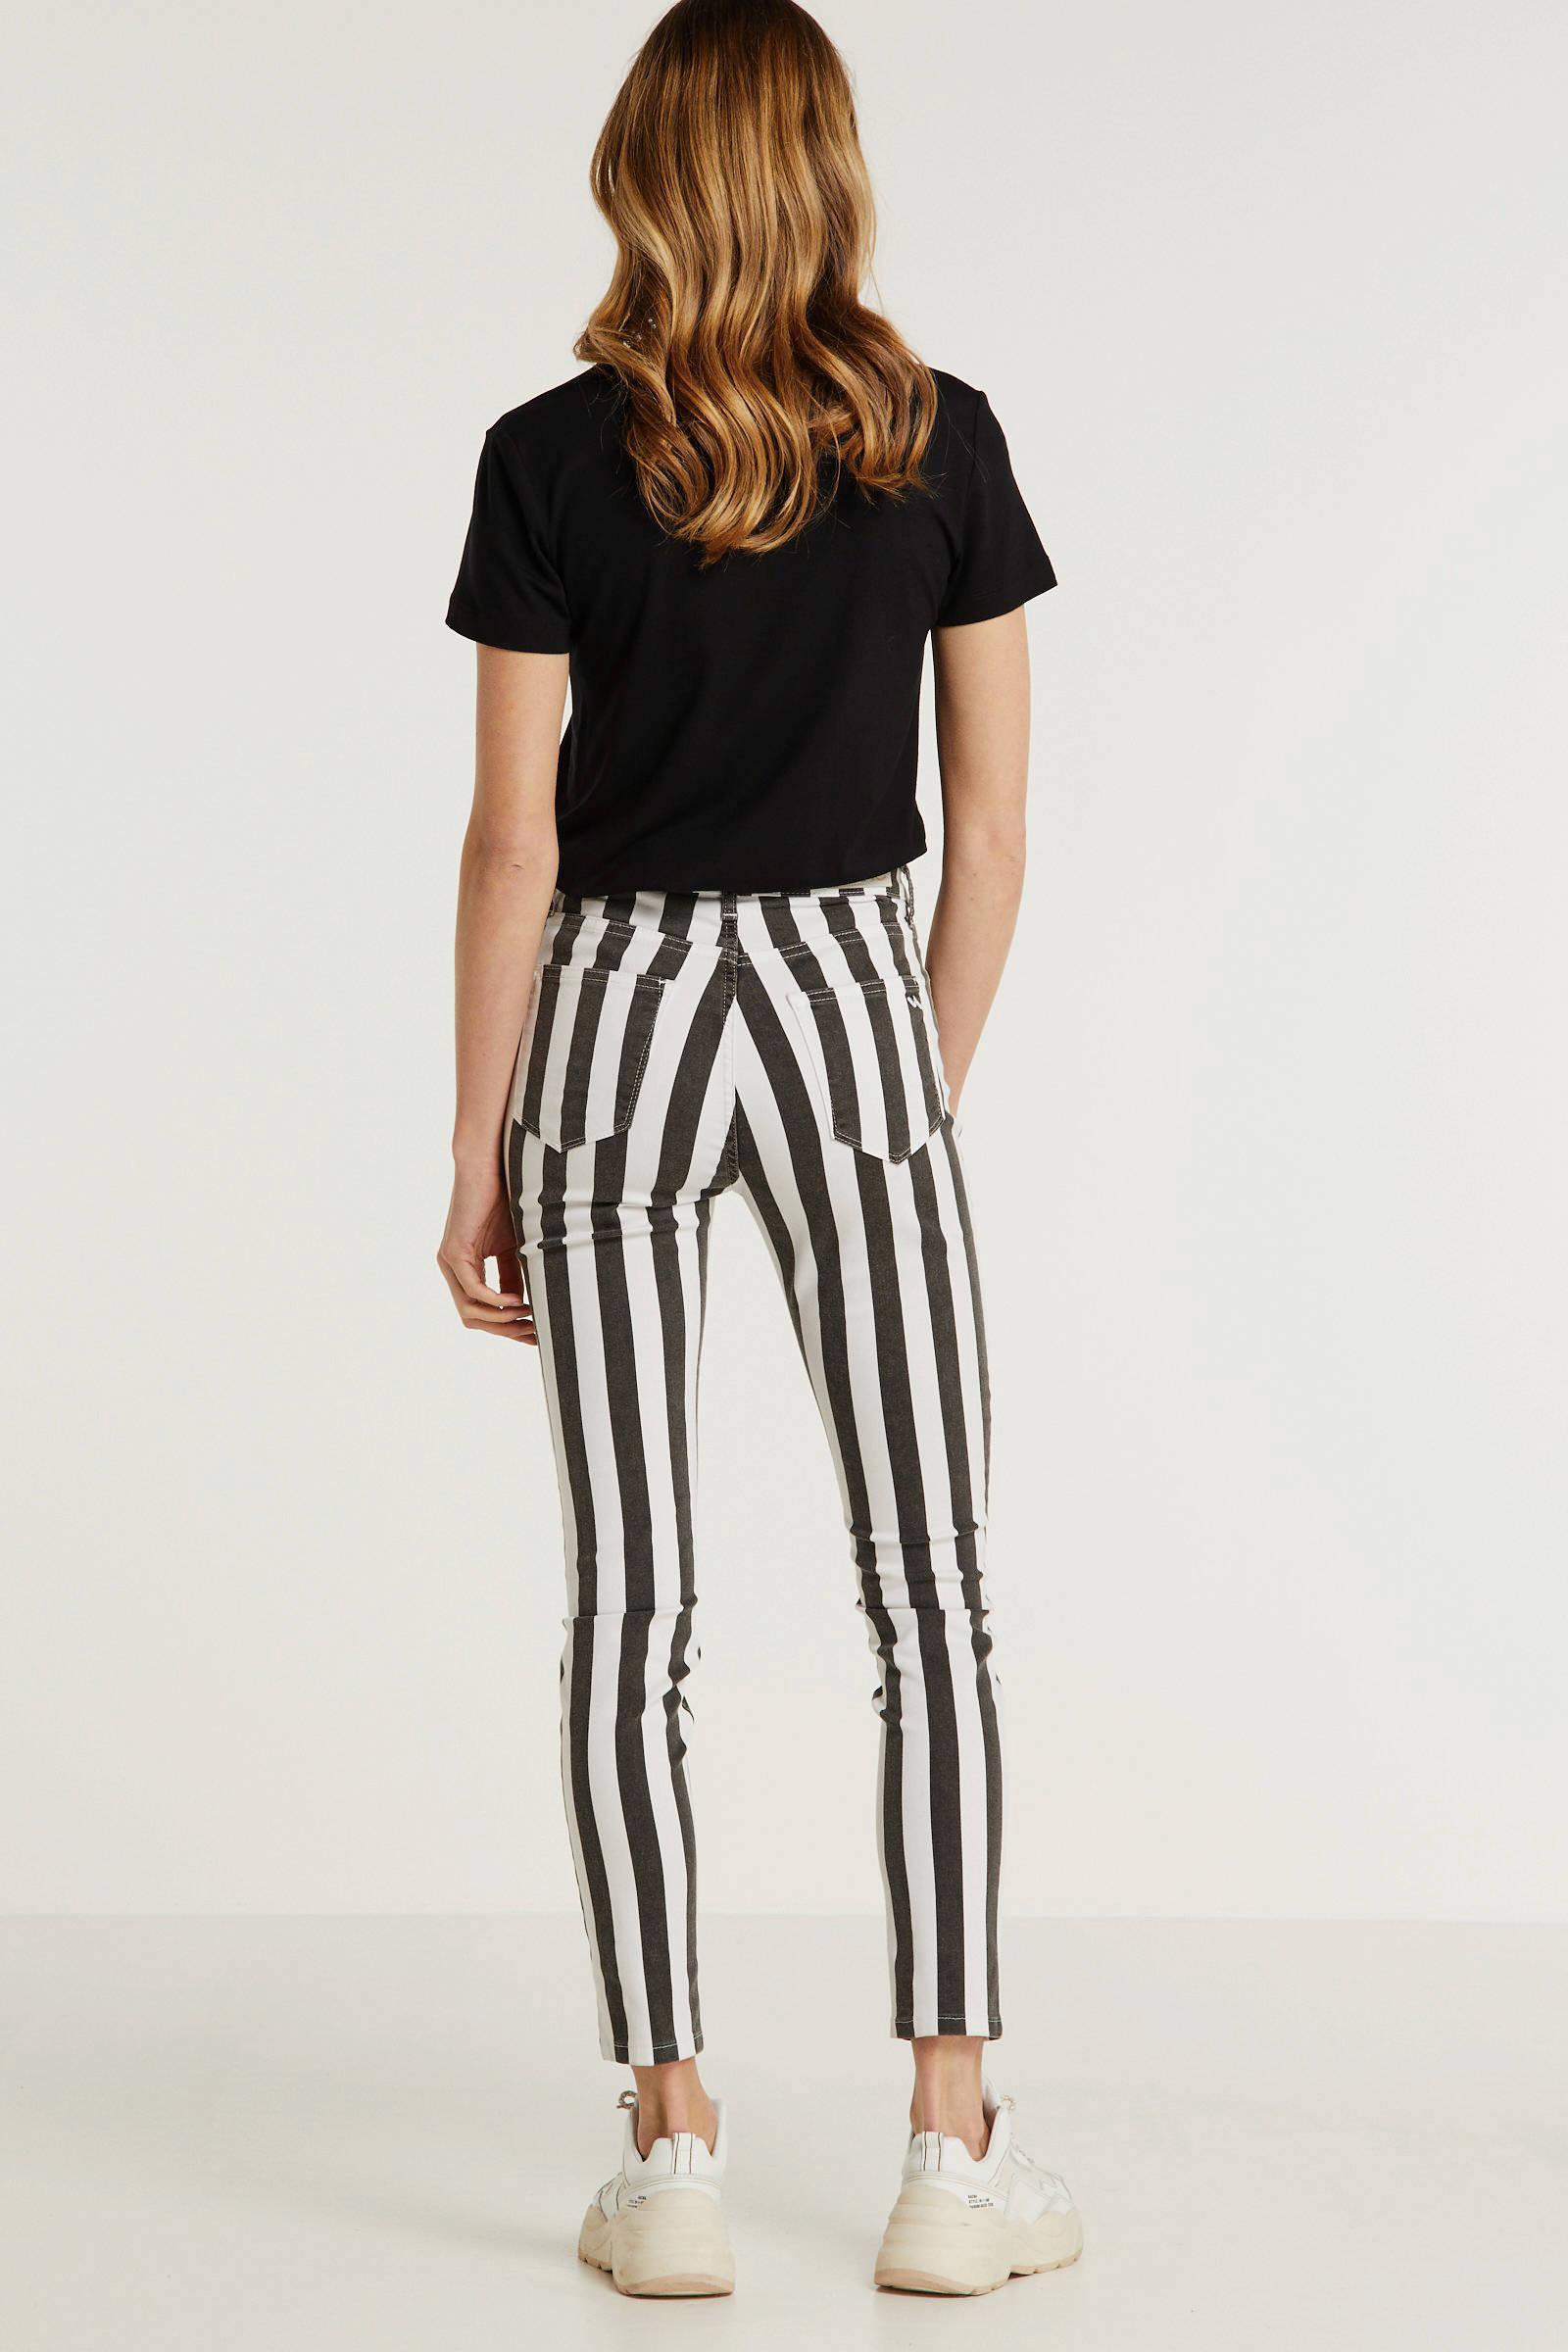 LTB gestreepte high waist skinny broek Tanya X zwartwit